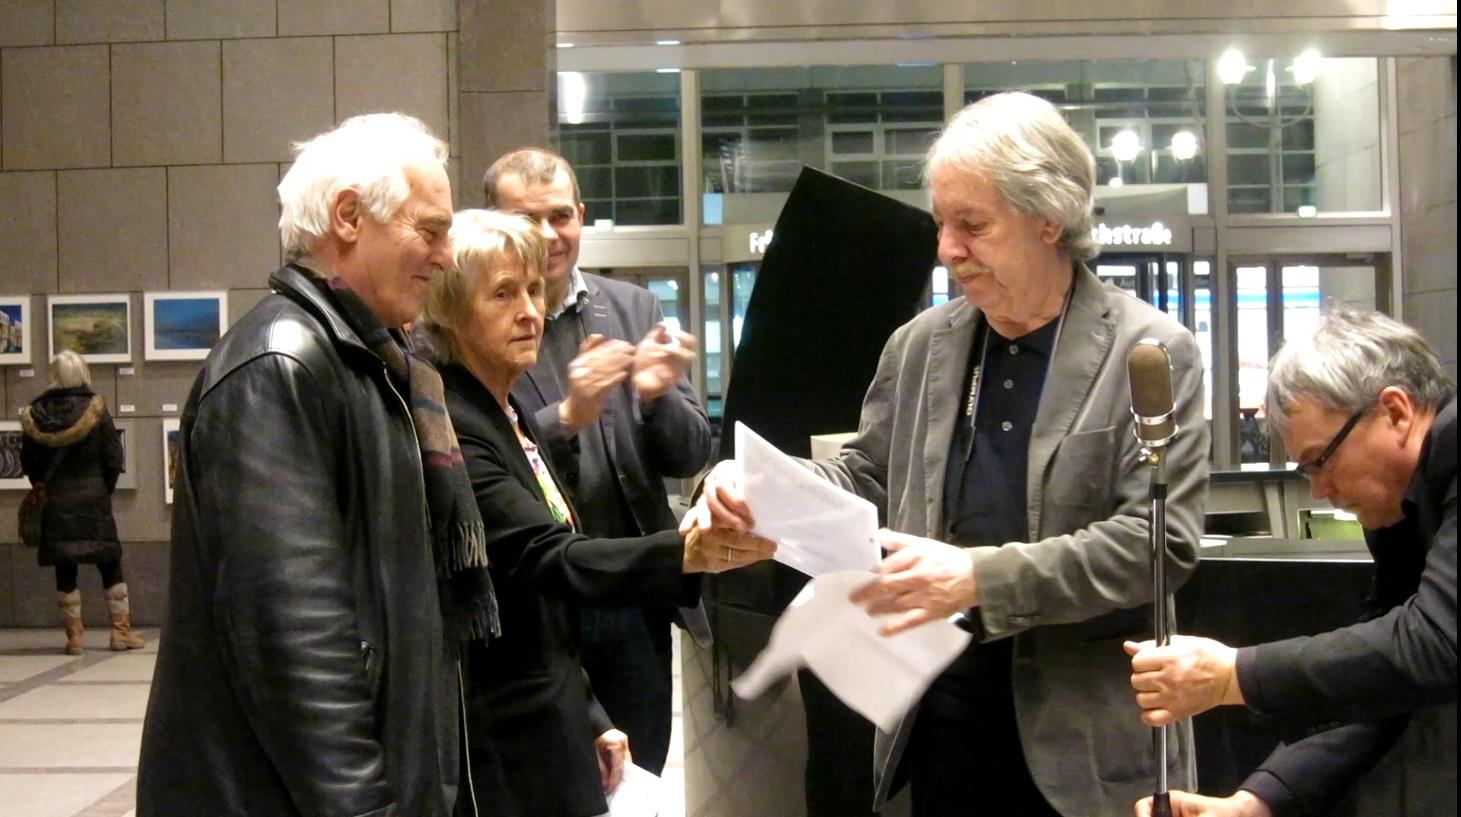 2018.02.15 Berlinx Mitte Verleihung Urkunde LAFO 2